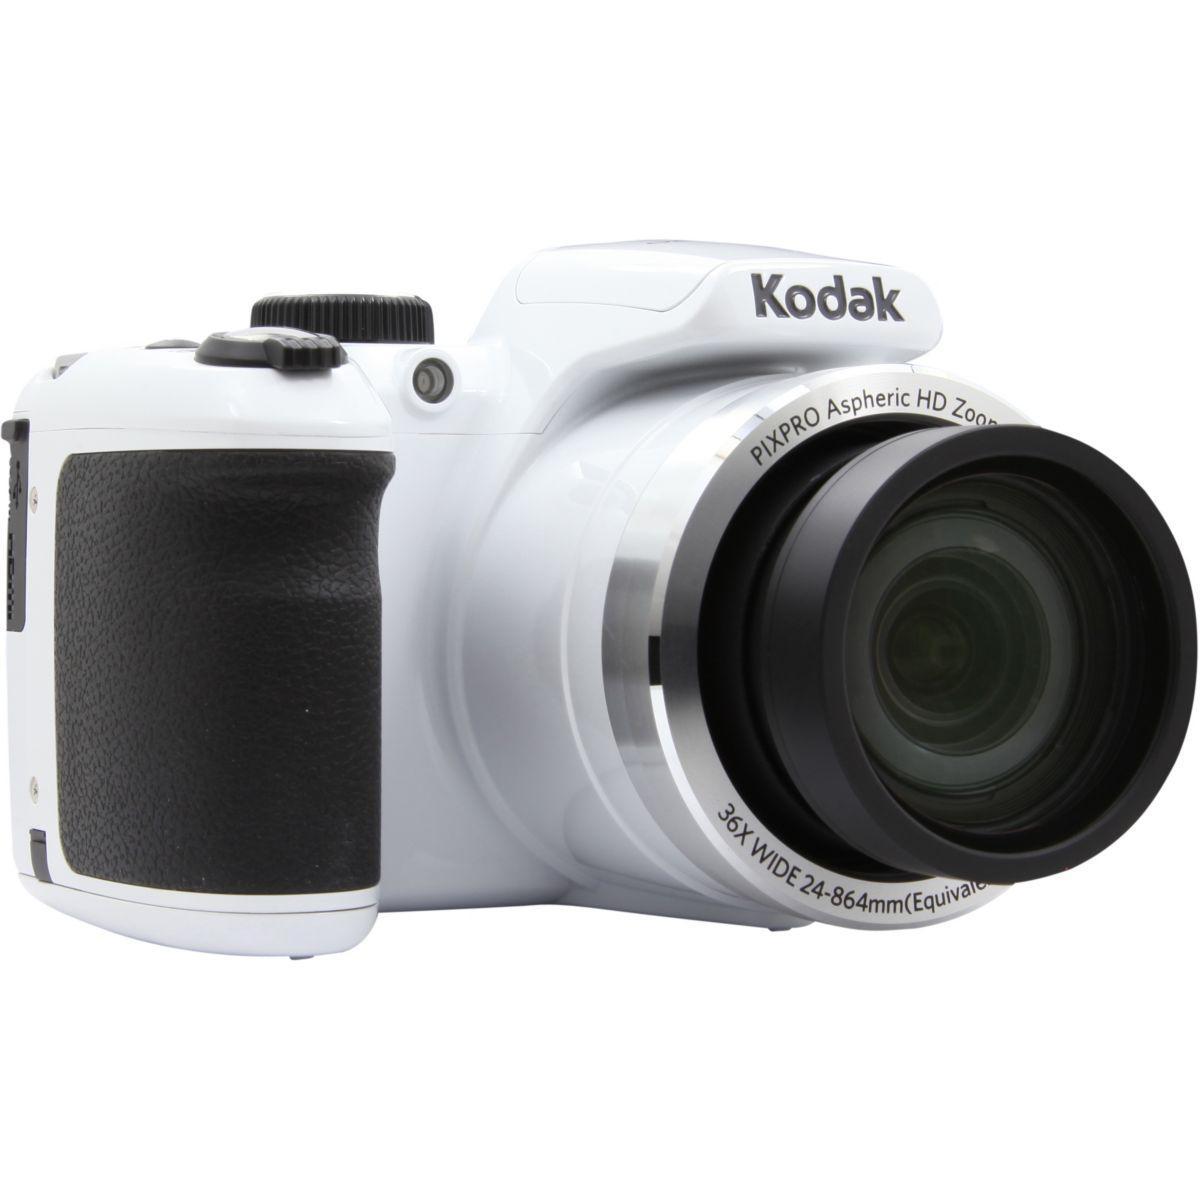 Appareil photo bridge kodak pixpro az365 blanc - 7% de remise immédiate avec le code : multi7 (photo)